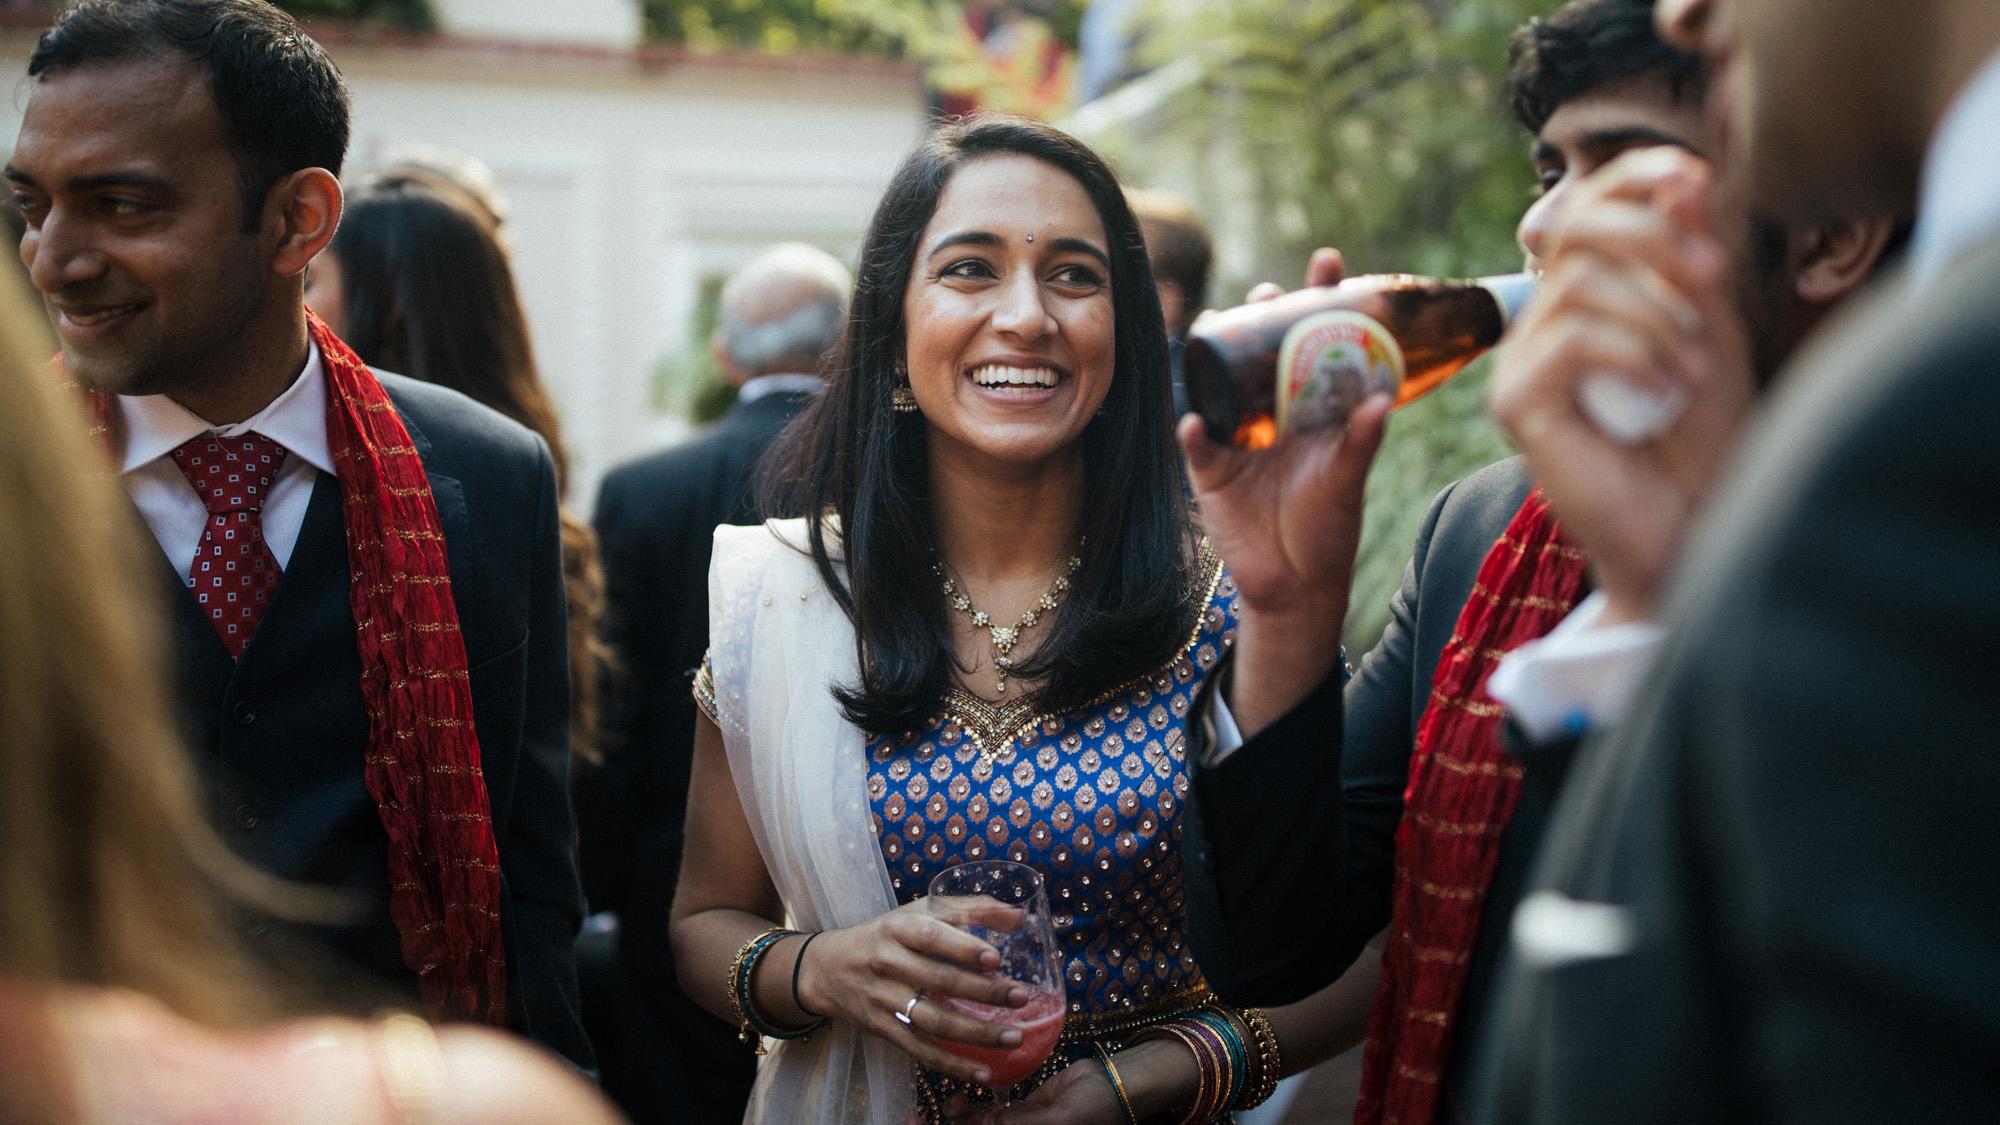 anu_maneesh_alec_vanderboom_Indian_wedding_photography-0128.jpg